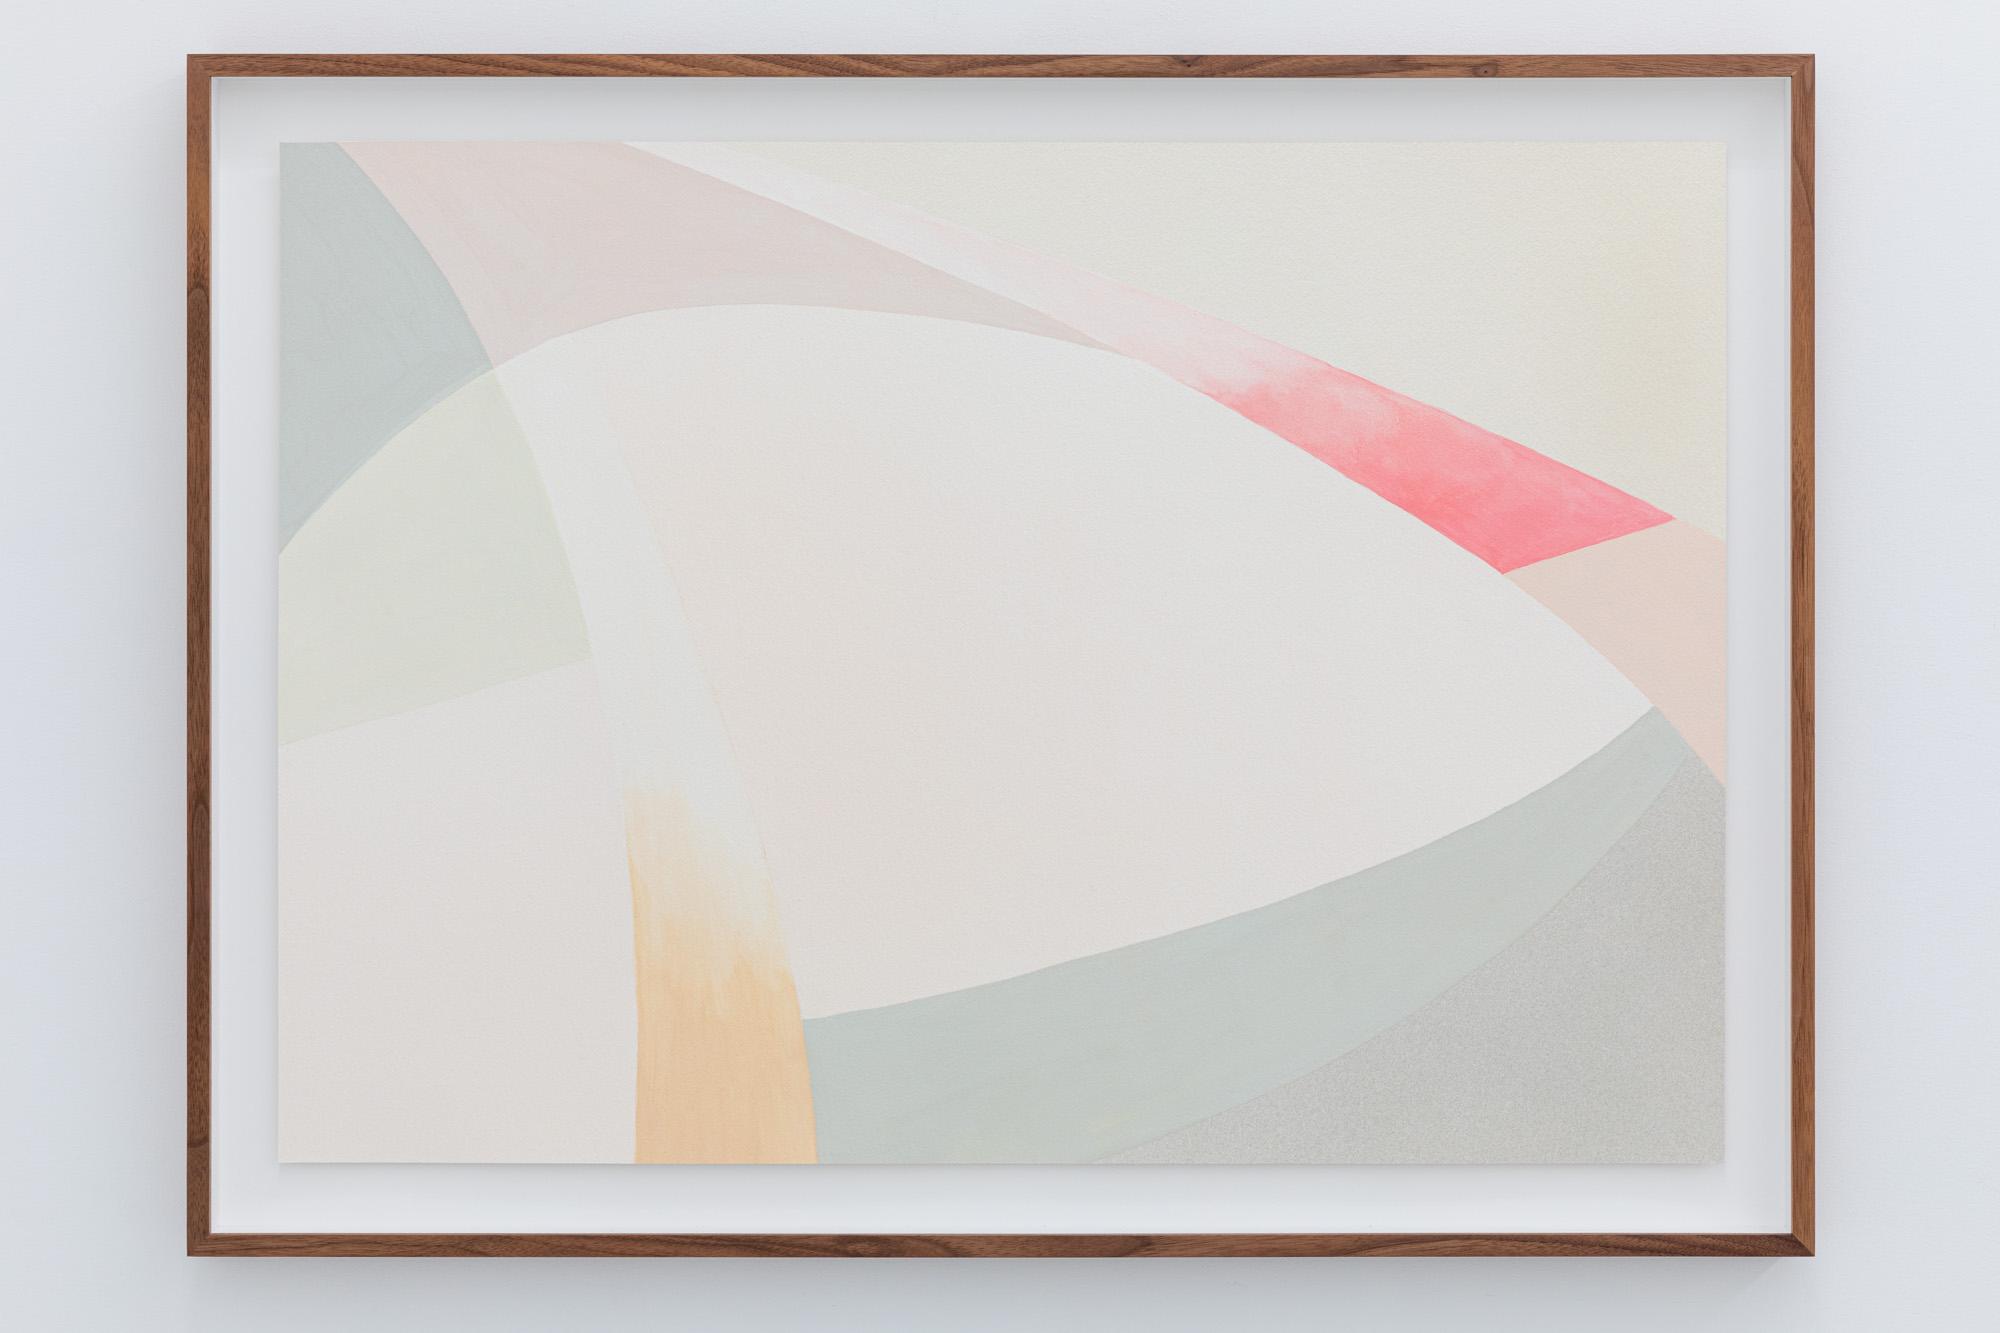 Lightcurves VII, 2020, Watercolor and casein tempera on 640 gsm Arches Grain Torchon paper, 59 x 82,5 cm, Unique